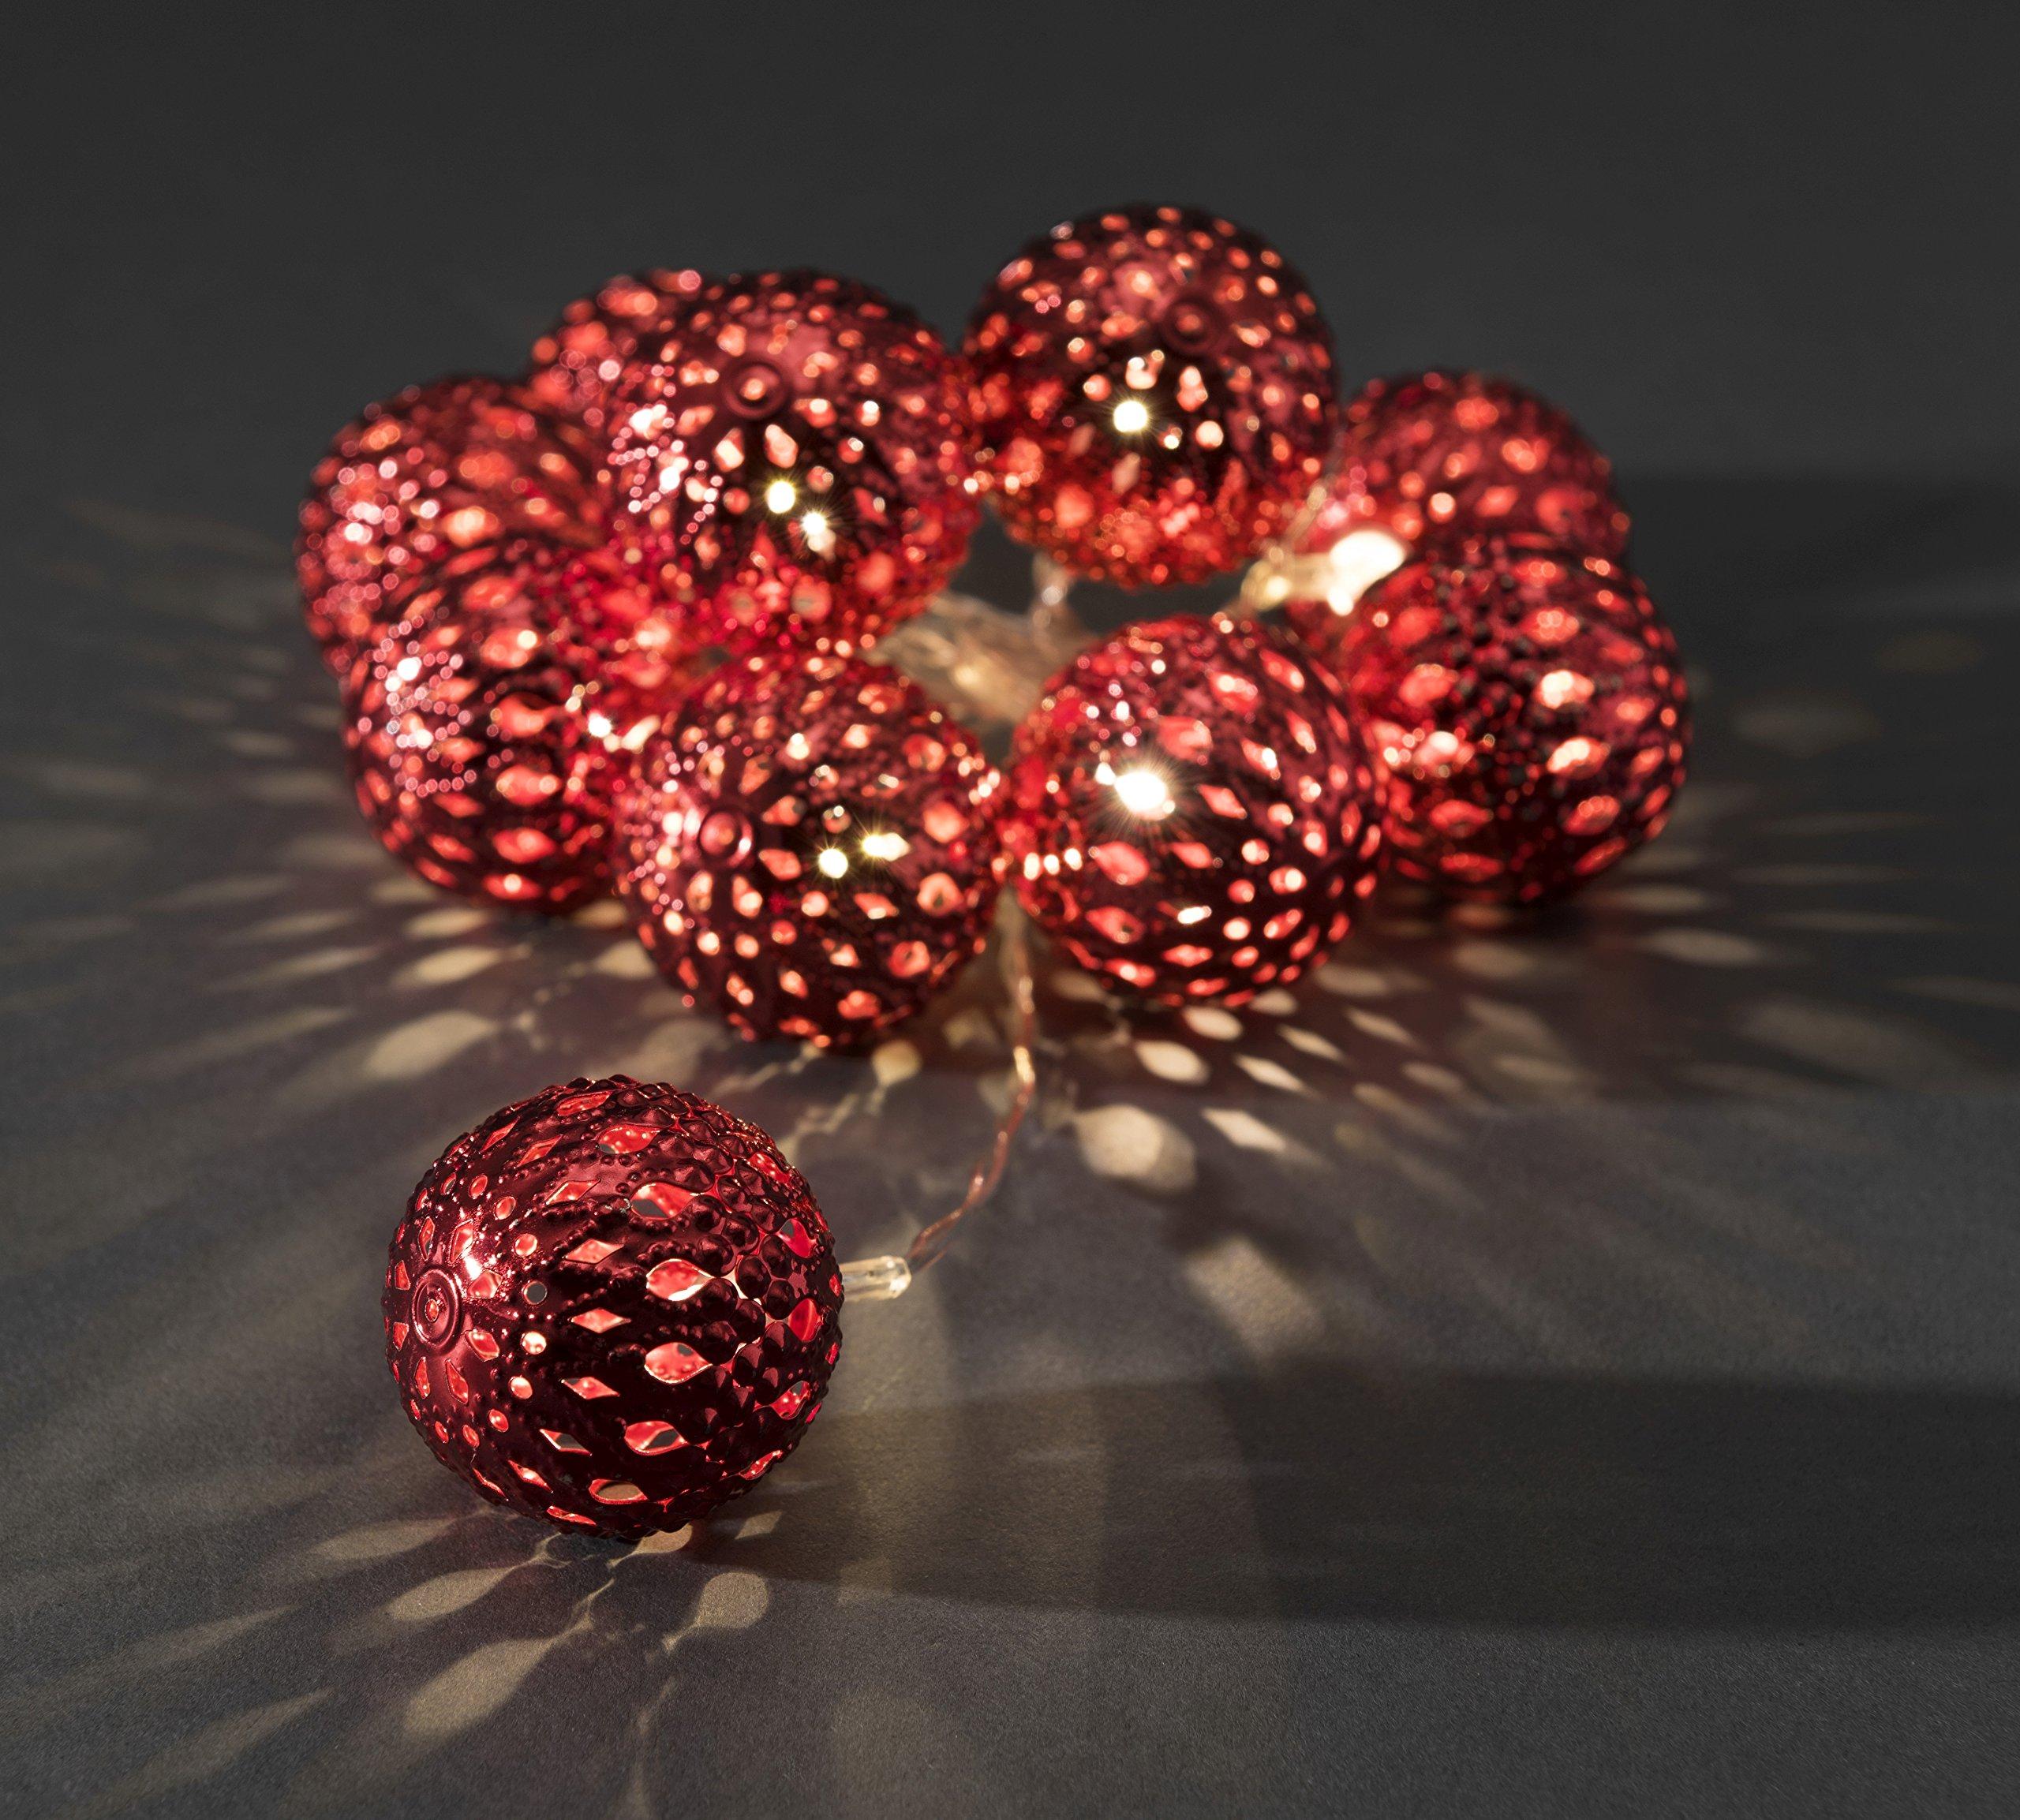 Konstsmide-3157-553-LED-Dekolichterkette-groe-rote-Metallblle-fr-Innen-IP20-Batteriebetrieben-3xAA-15V-exkl-10-warm-weie-Dioden-transparentes-Kabel